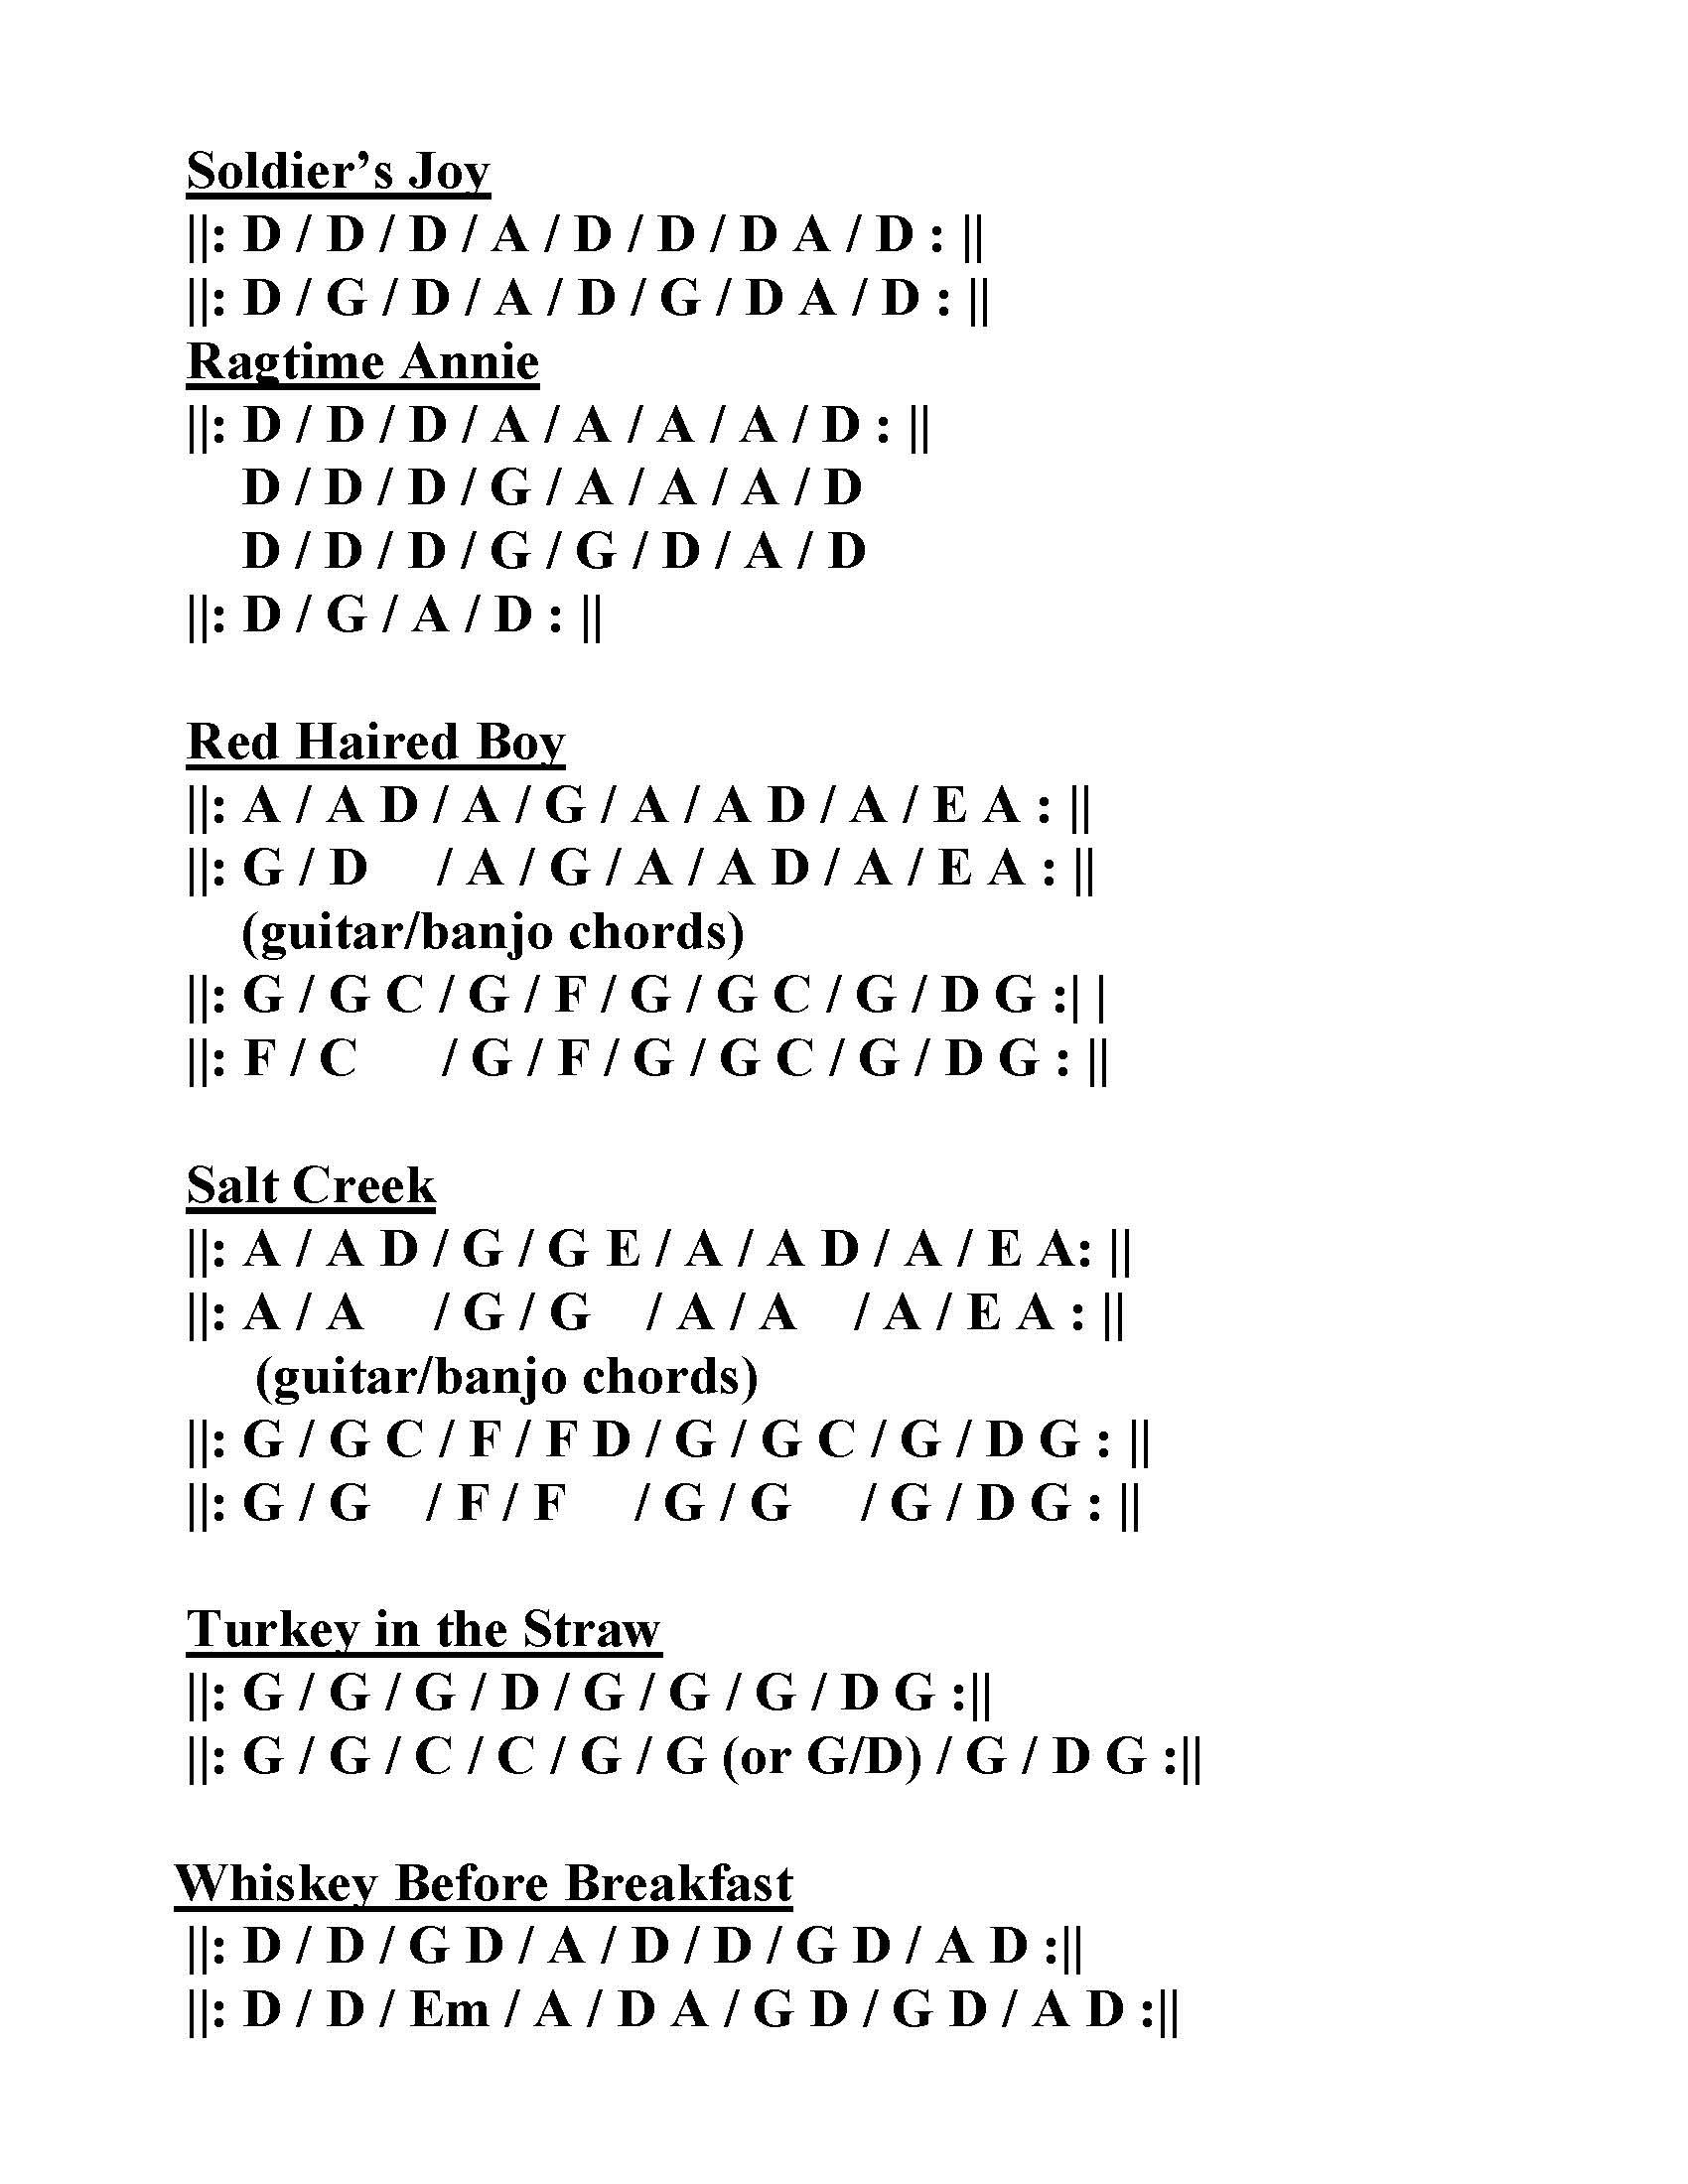 Jam instrumental chord progressions_Page_3.jpg